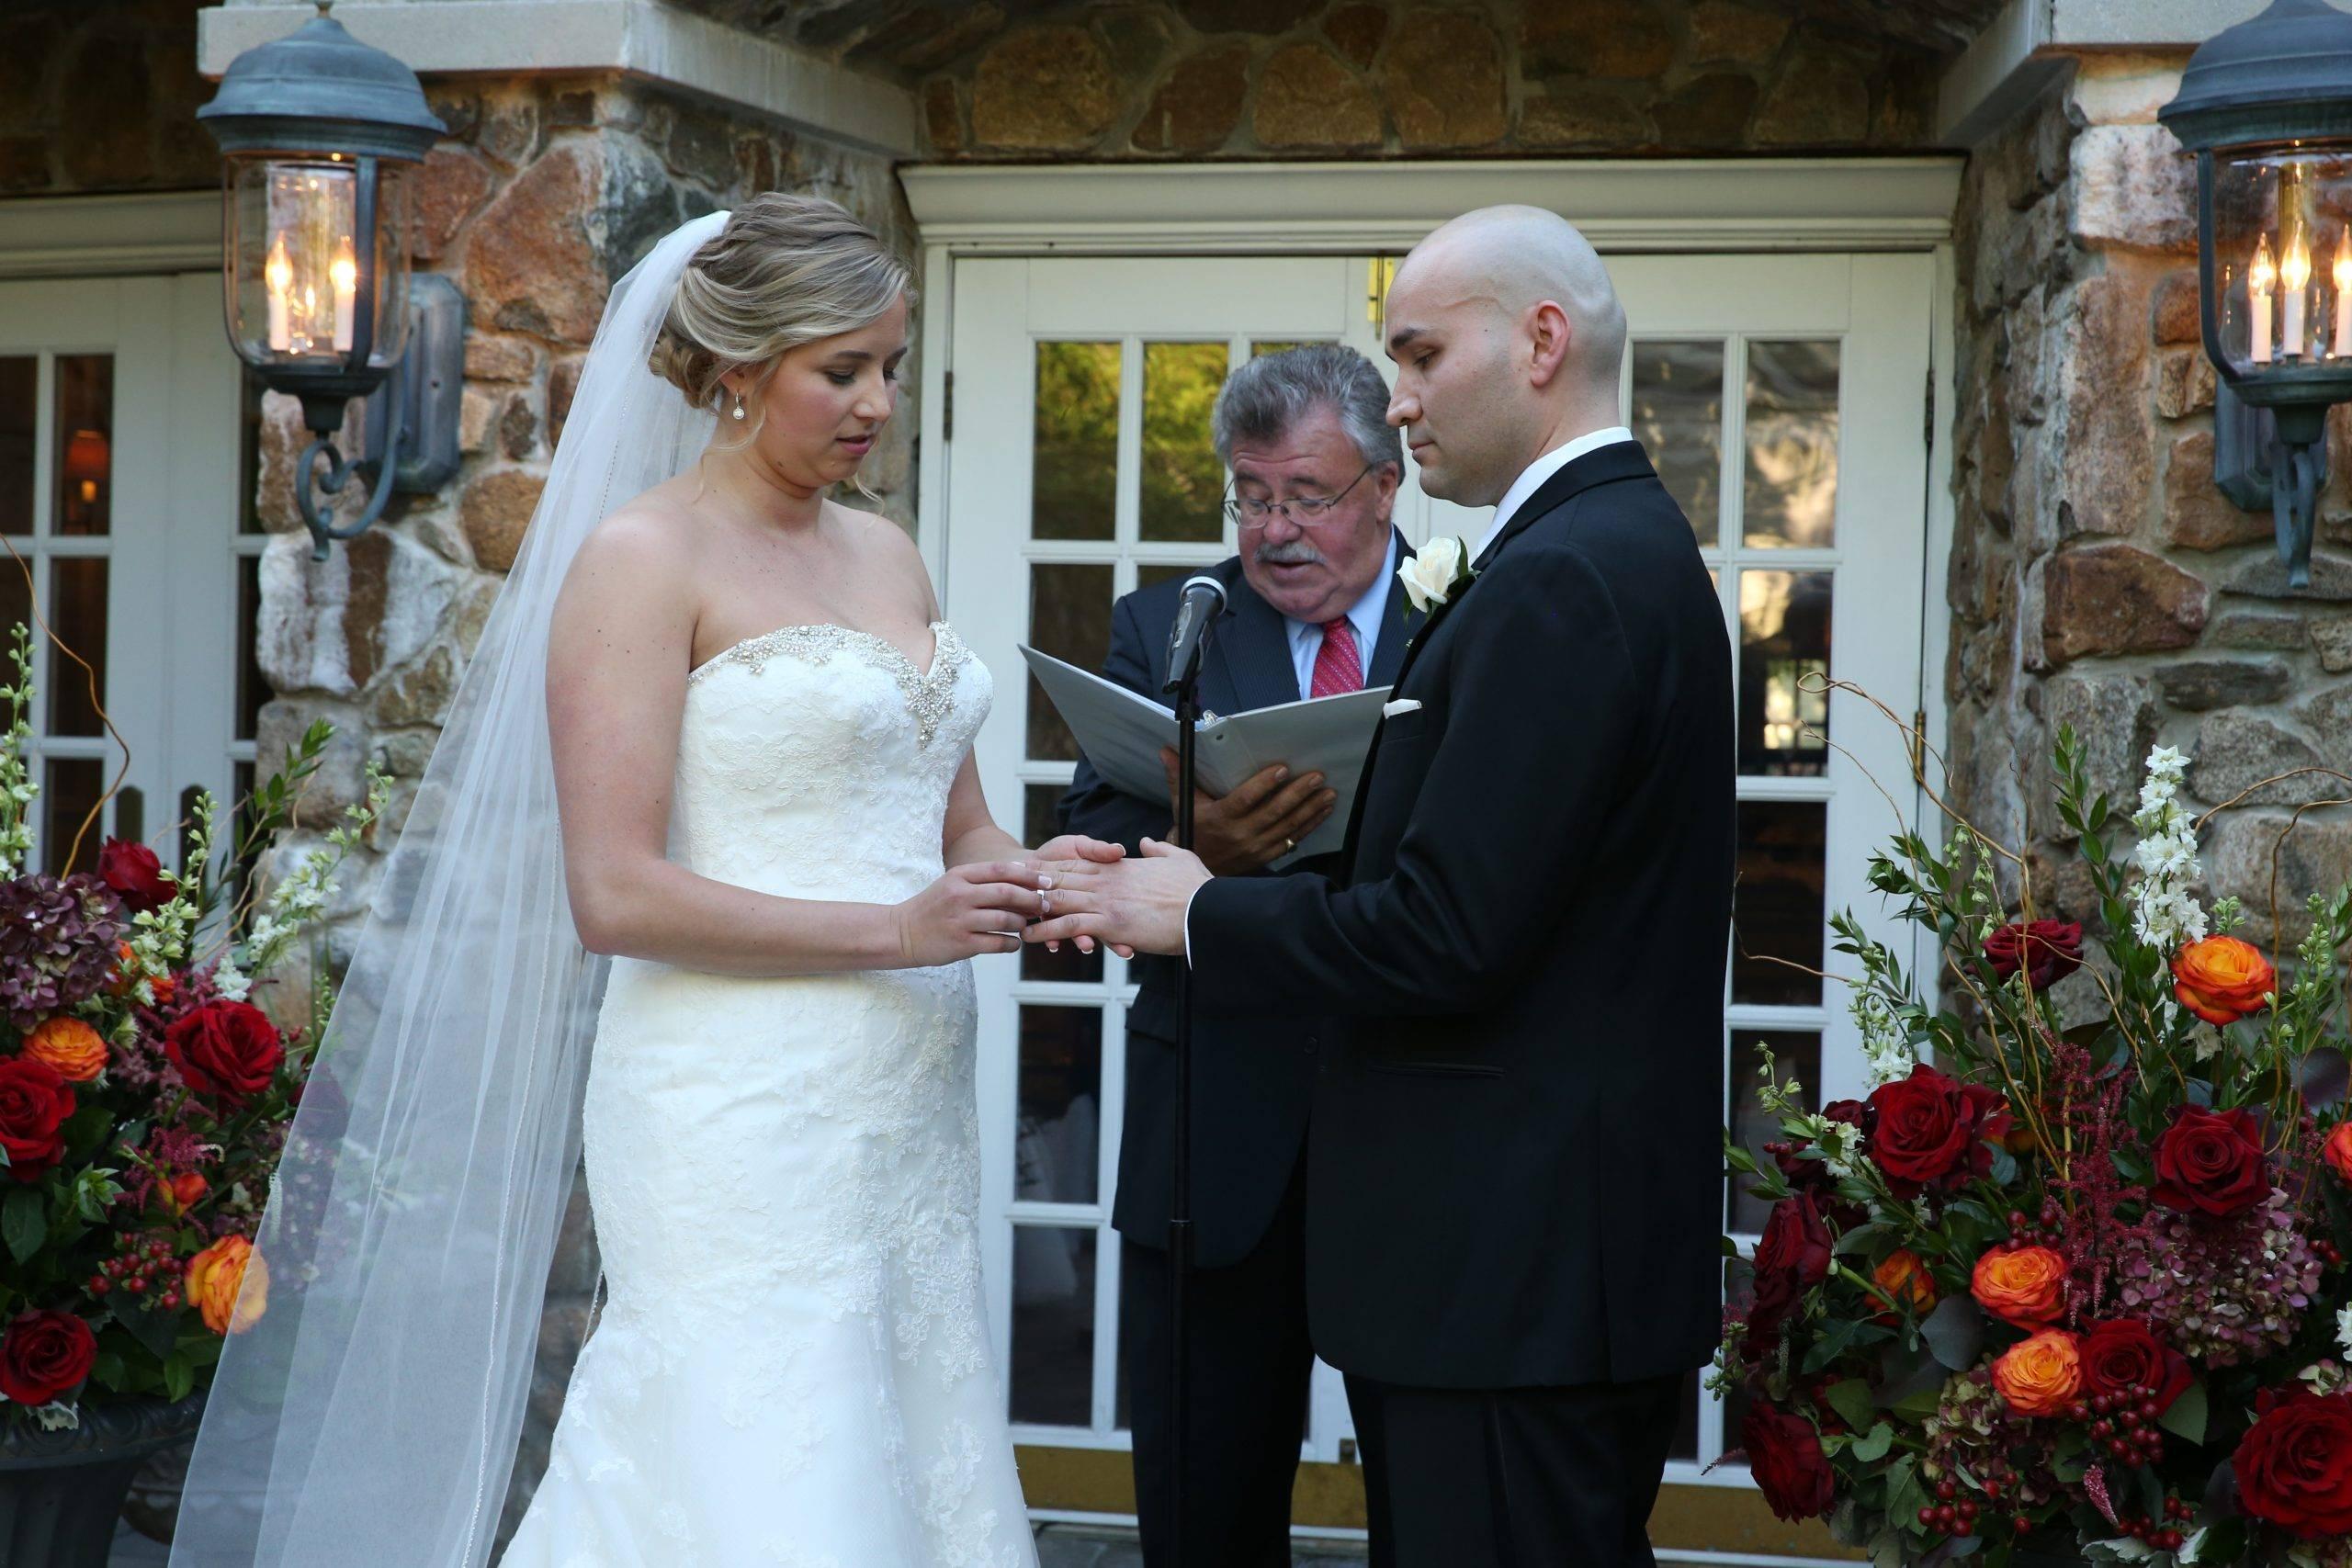 Olde Mill Inn wedding ring exchange